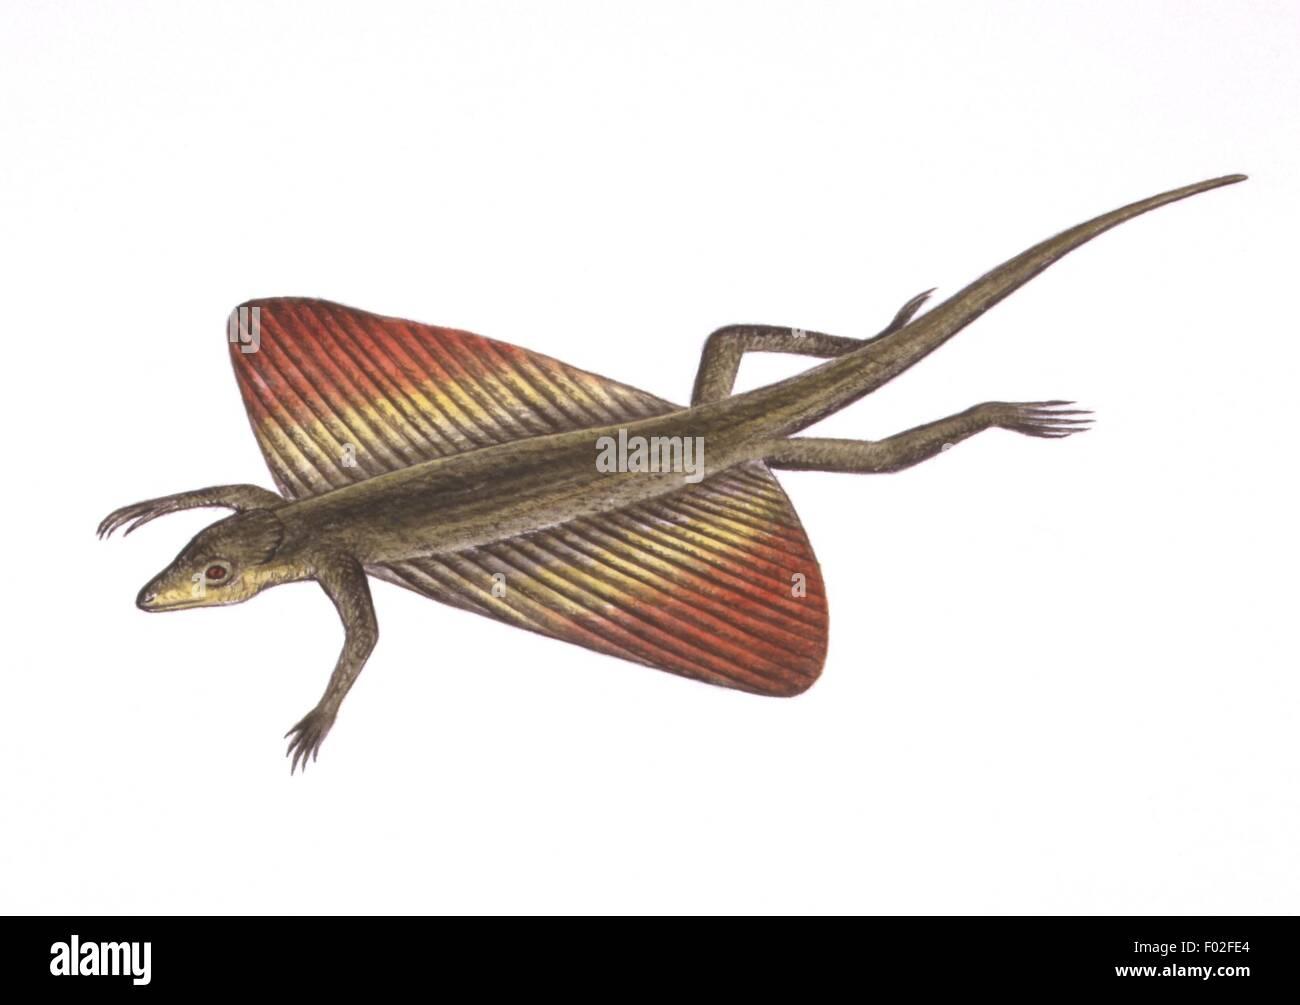 Zoology - Reptiles - Flying lizard (Draco volans) - Art work by Simon Turvey - Stock Image